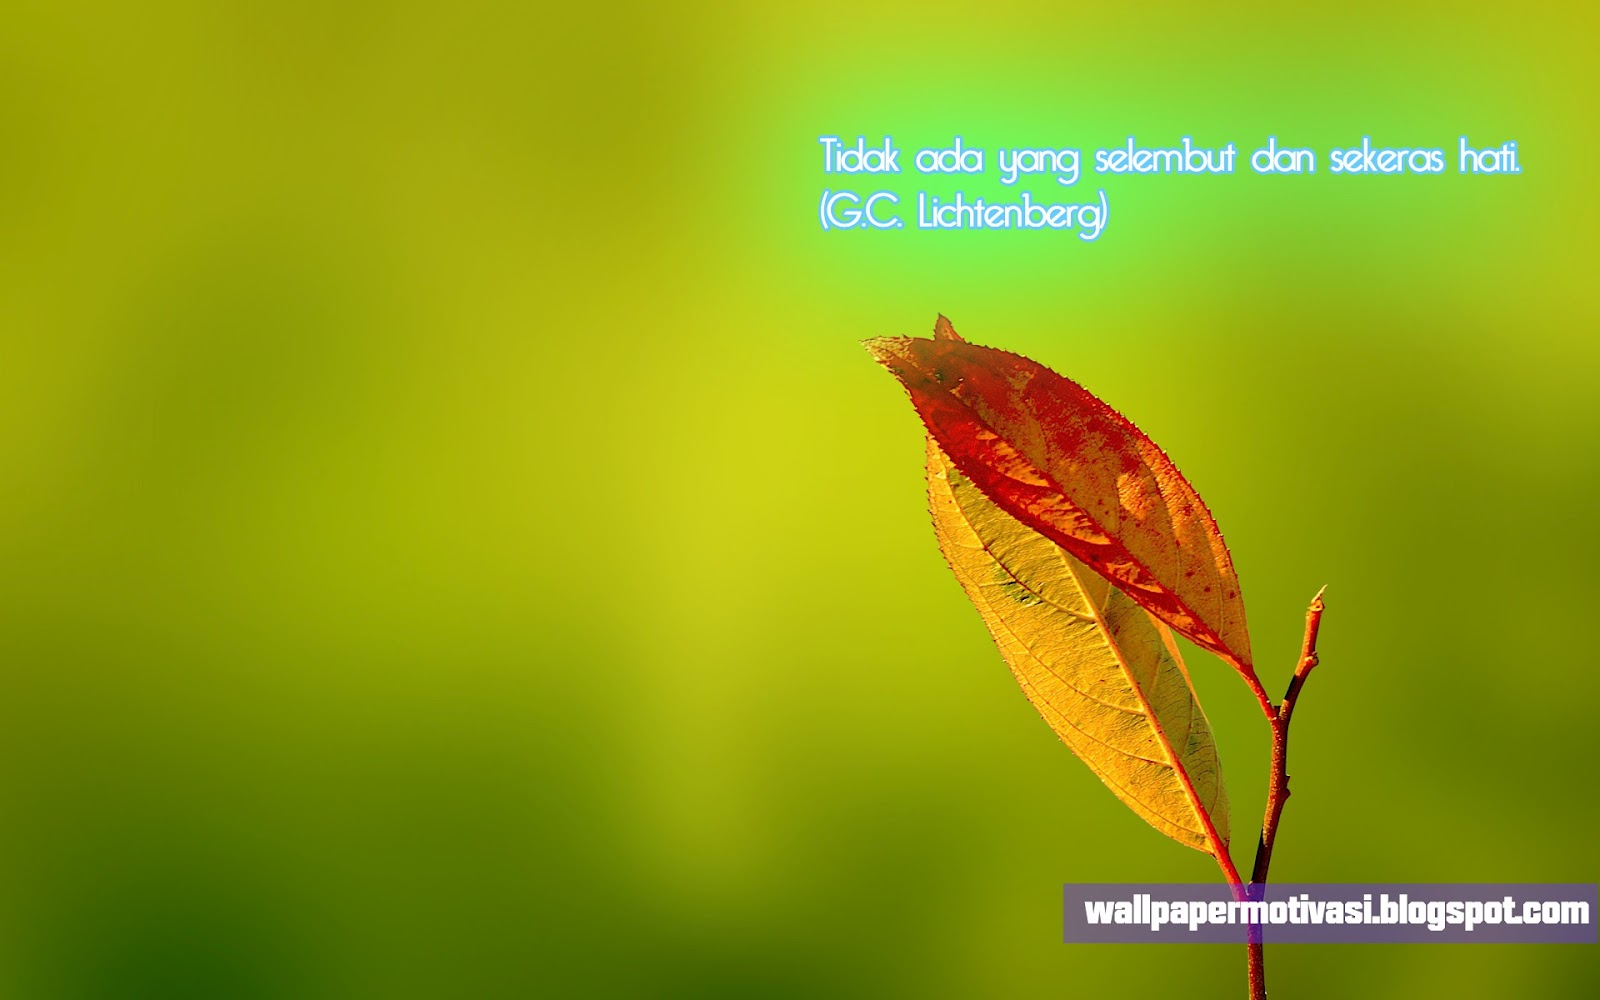 http://4.bp.blogspot.com/-KKiNEvvRaIw/UC8q-PD4IBI/AAAAAAAAAGc/-cE8w2-Pk7g/s1600/hati+keras+lembut+desktop.jpg